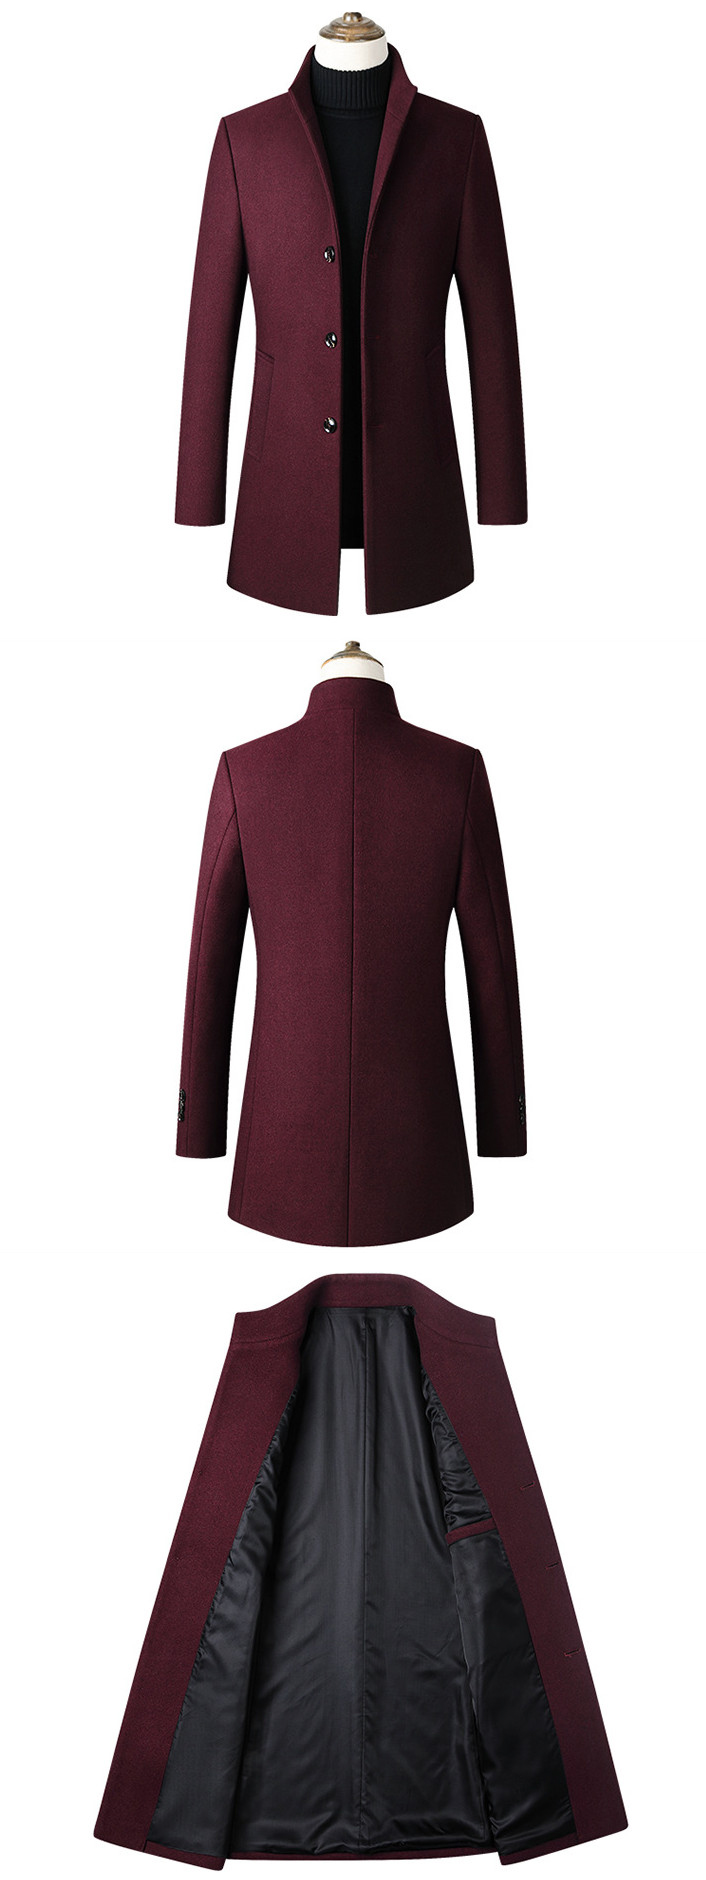 Winter Wool Jacket Men's High-quality Wool Coat casual Slim collar wool coat Men's long cotton collar trench coat 6